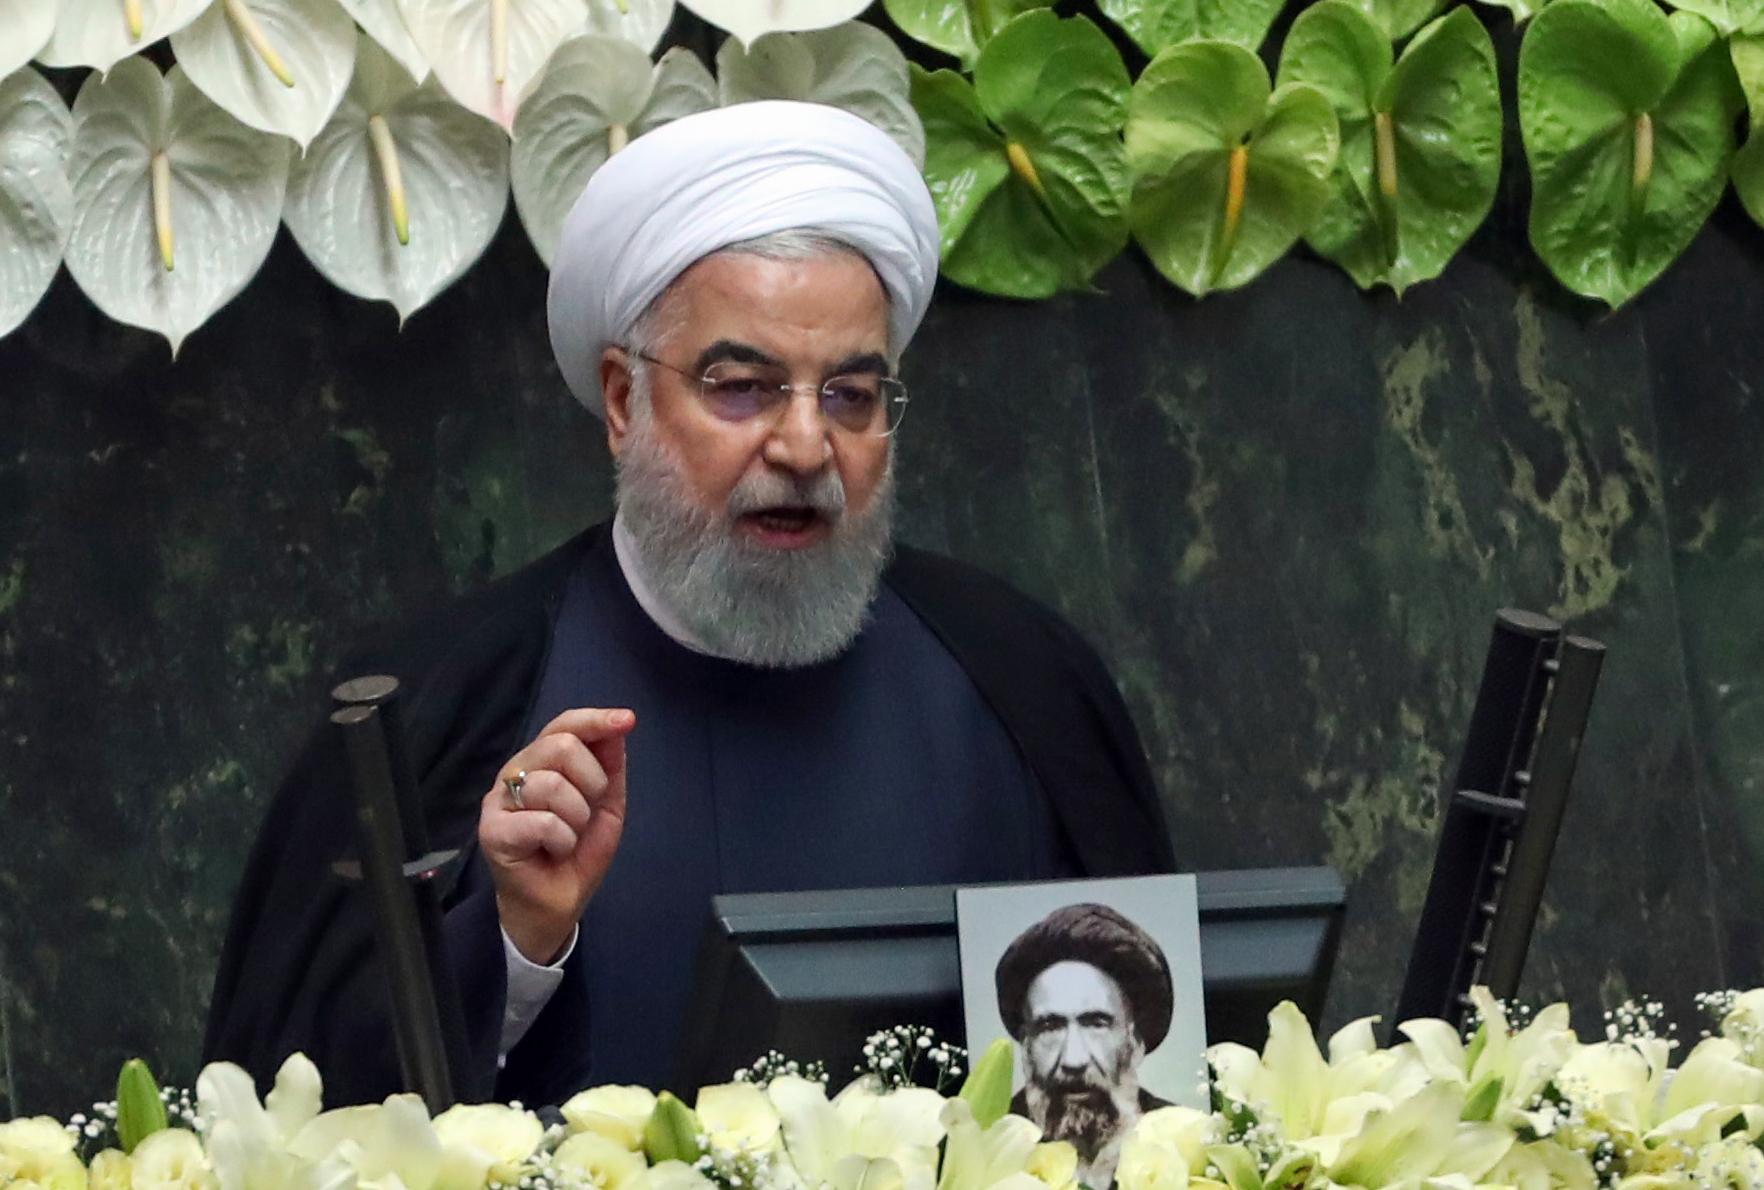 U.S. Sanctions Put Iran in Cash Crunch, Iran Envoy Says